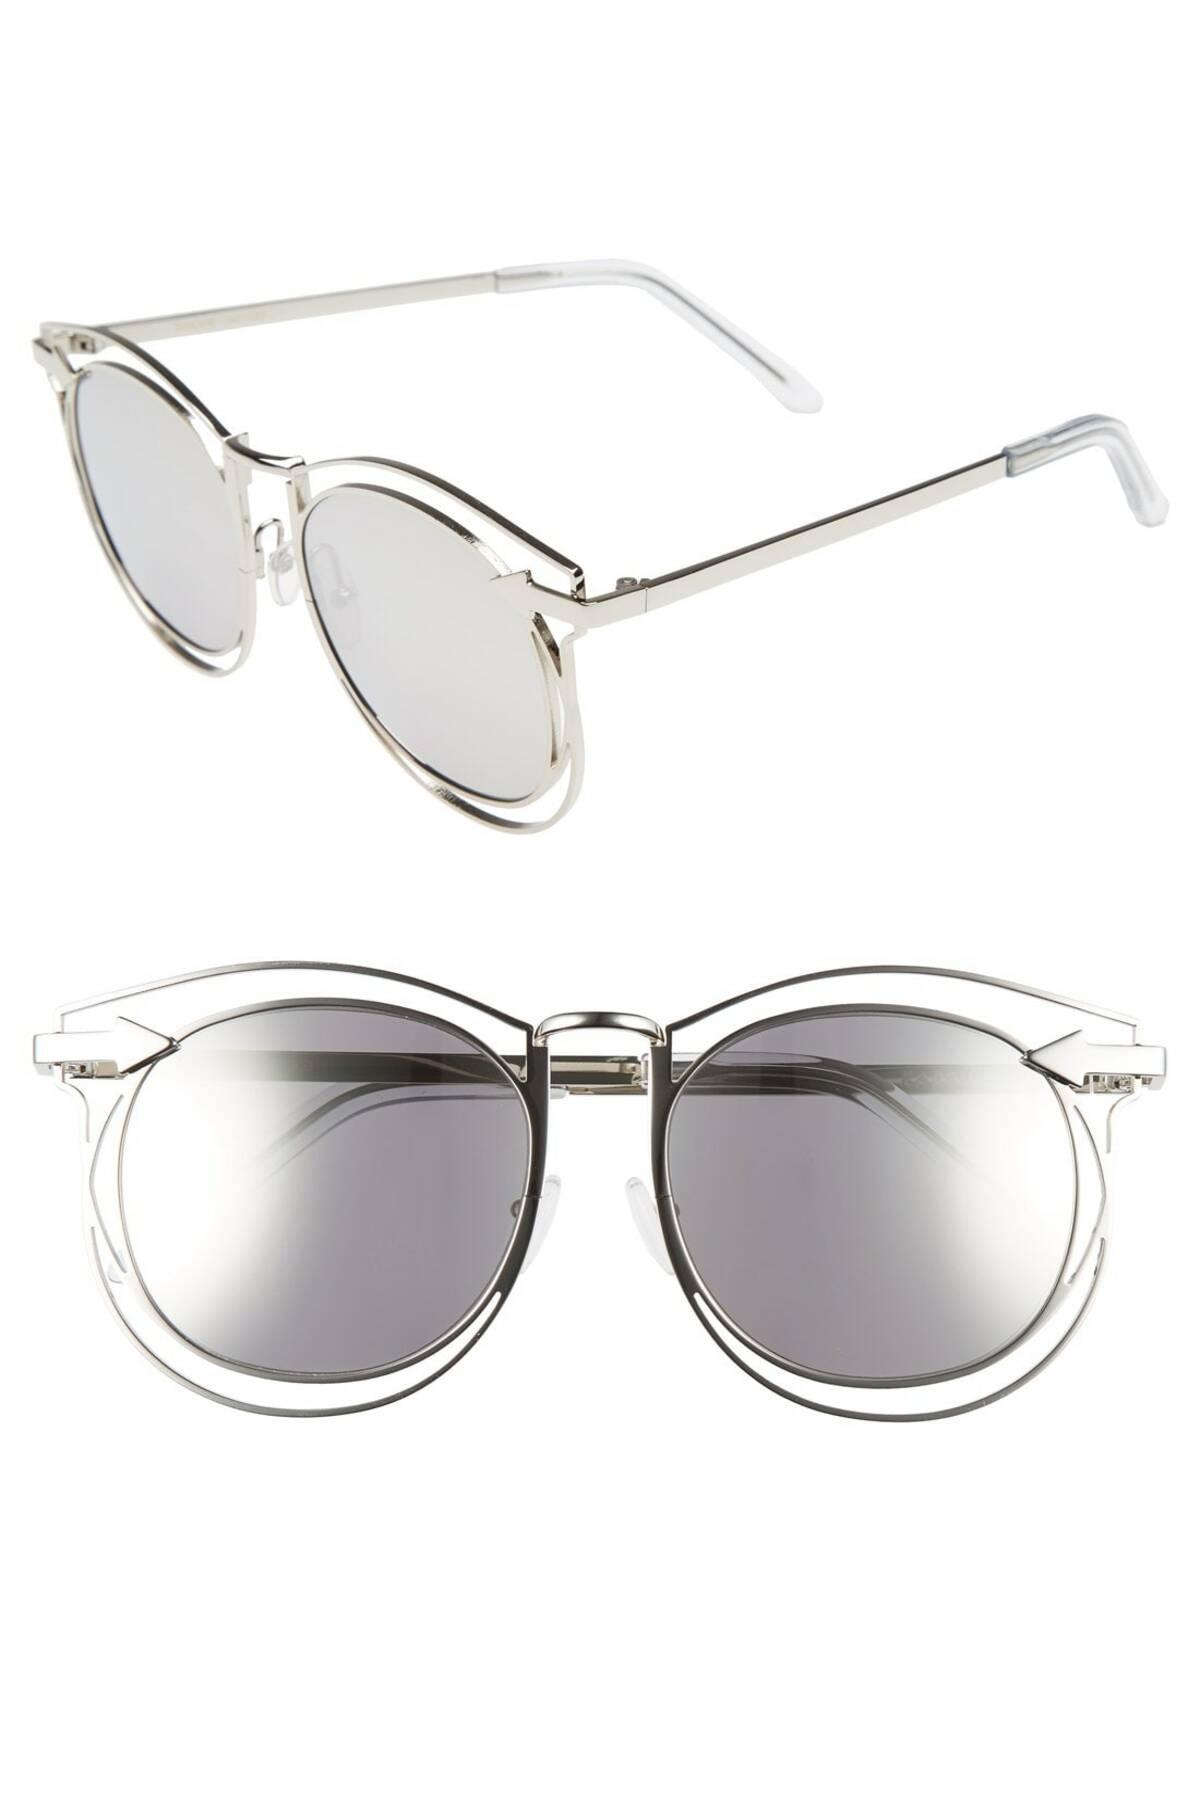 779b8faecfe8 Lyst - Karen Walker  simone  54mm Retro Sunglasses in Metallic ...